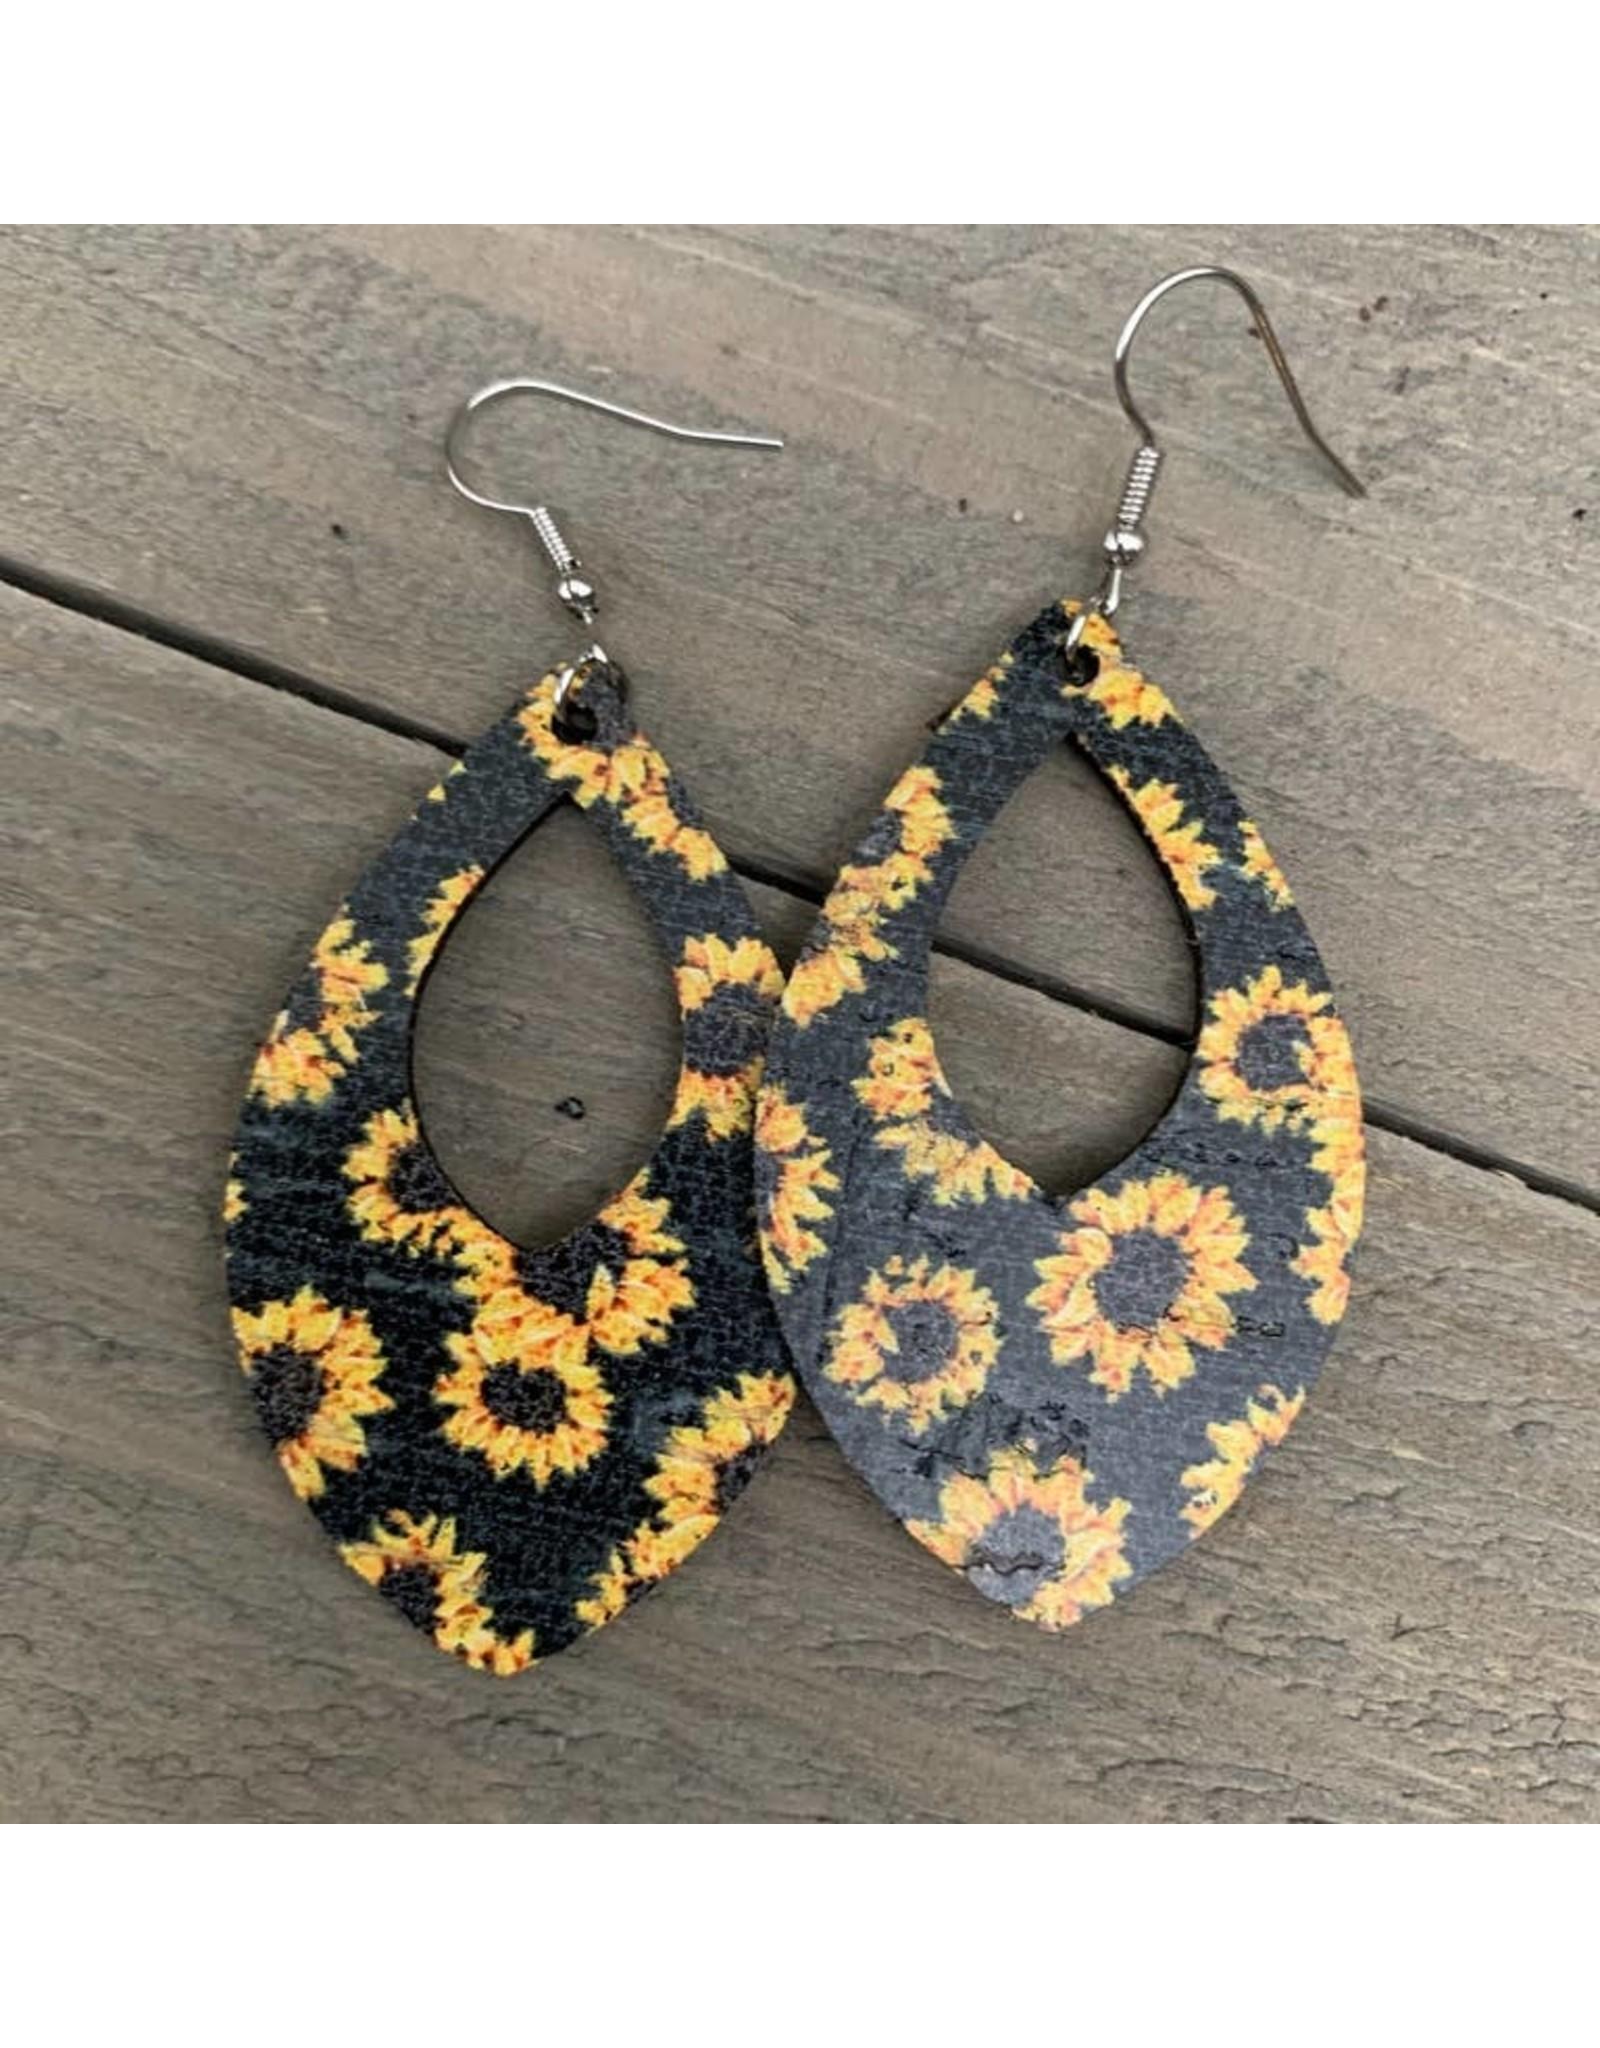 Jill's Jewels E/R- Black Sunflower Leather